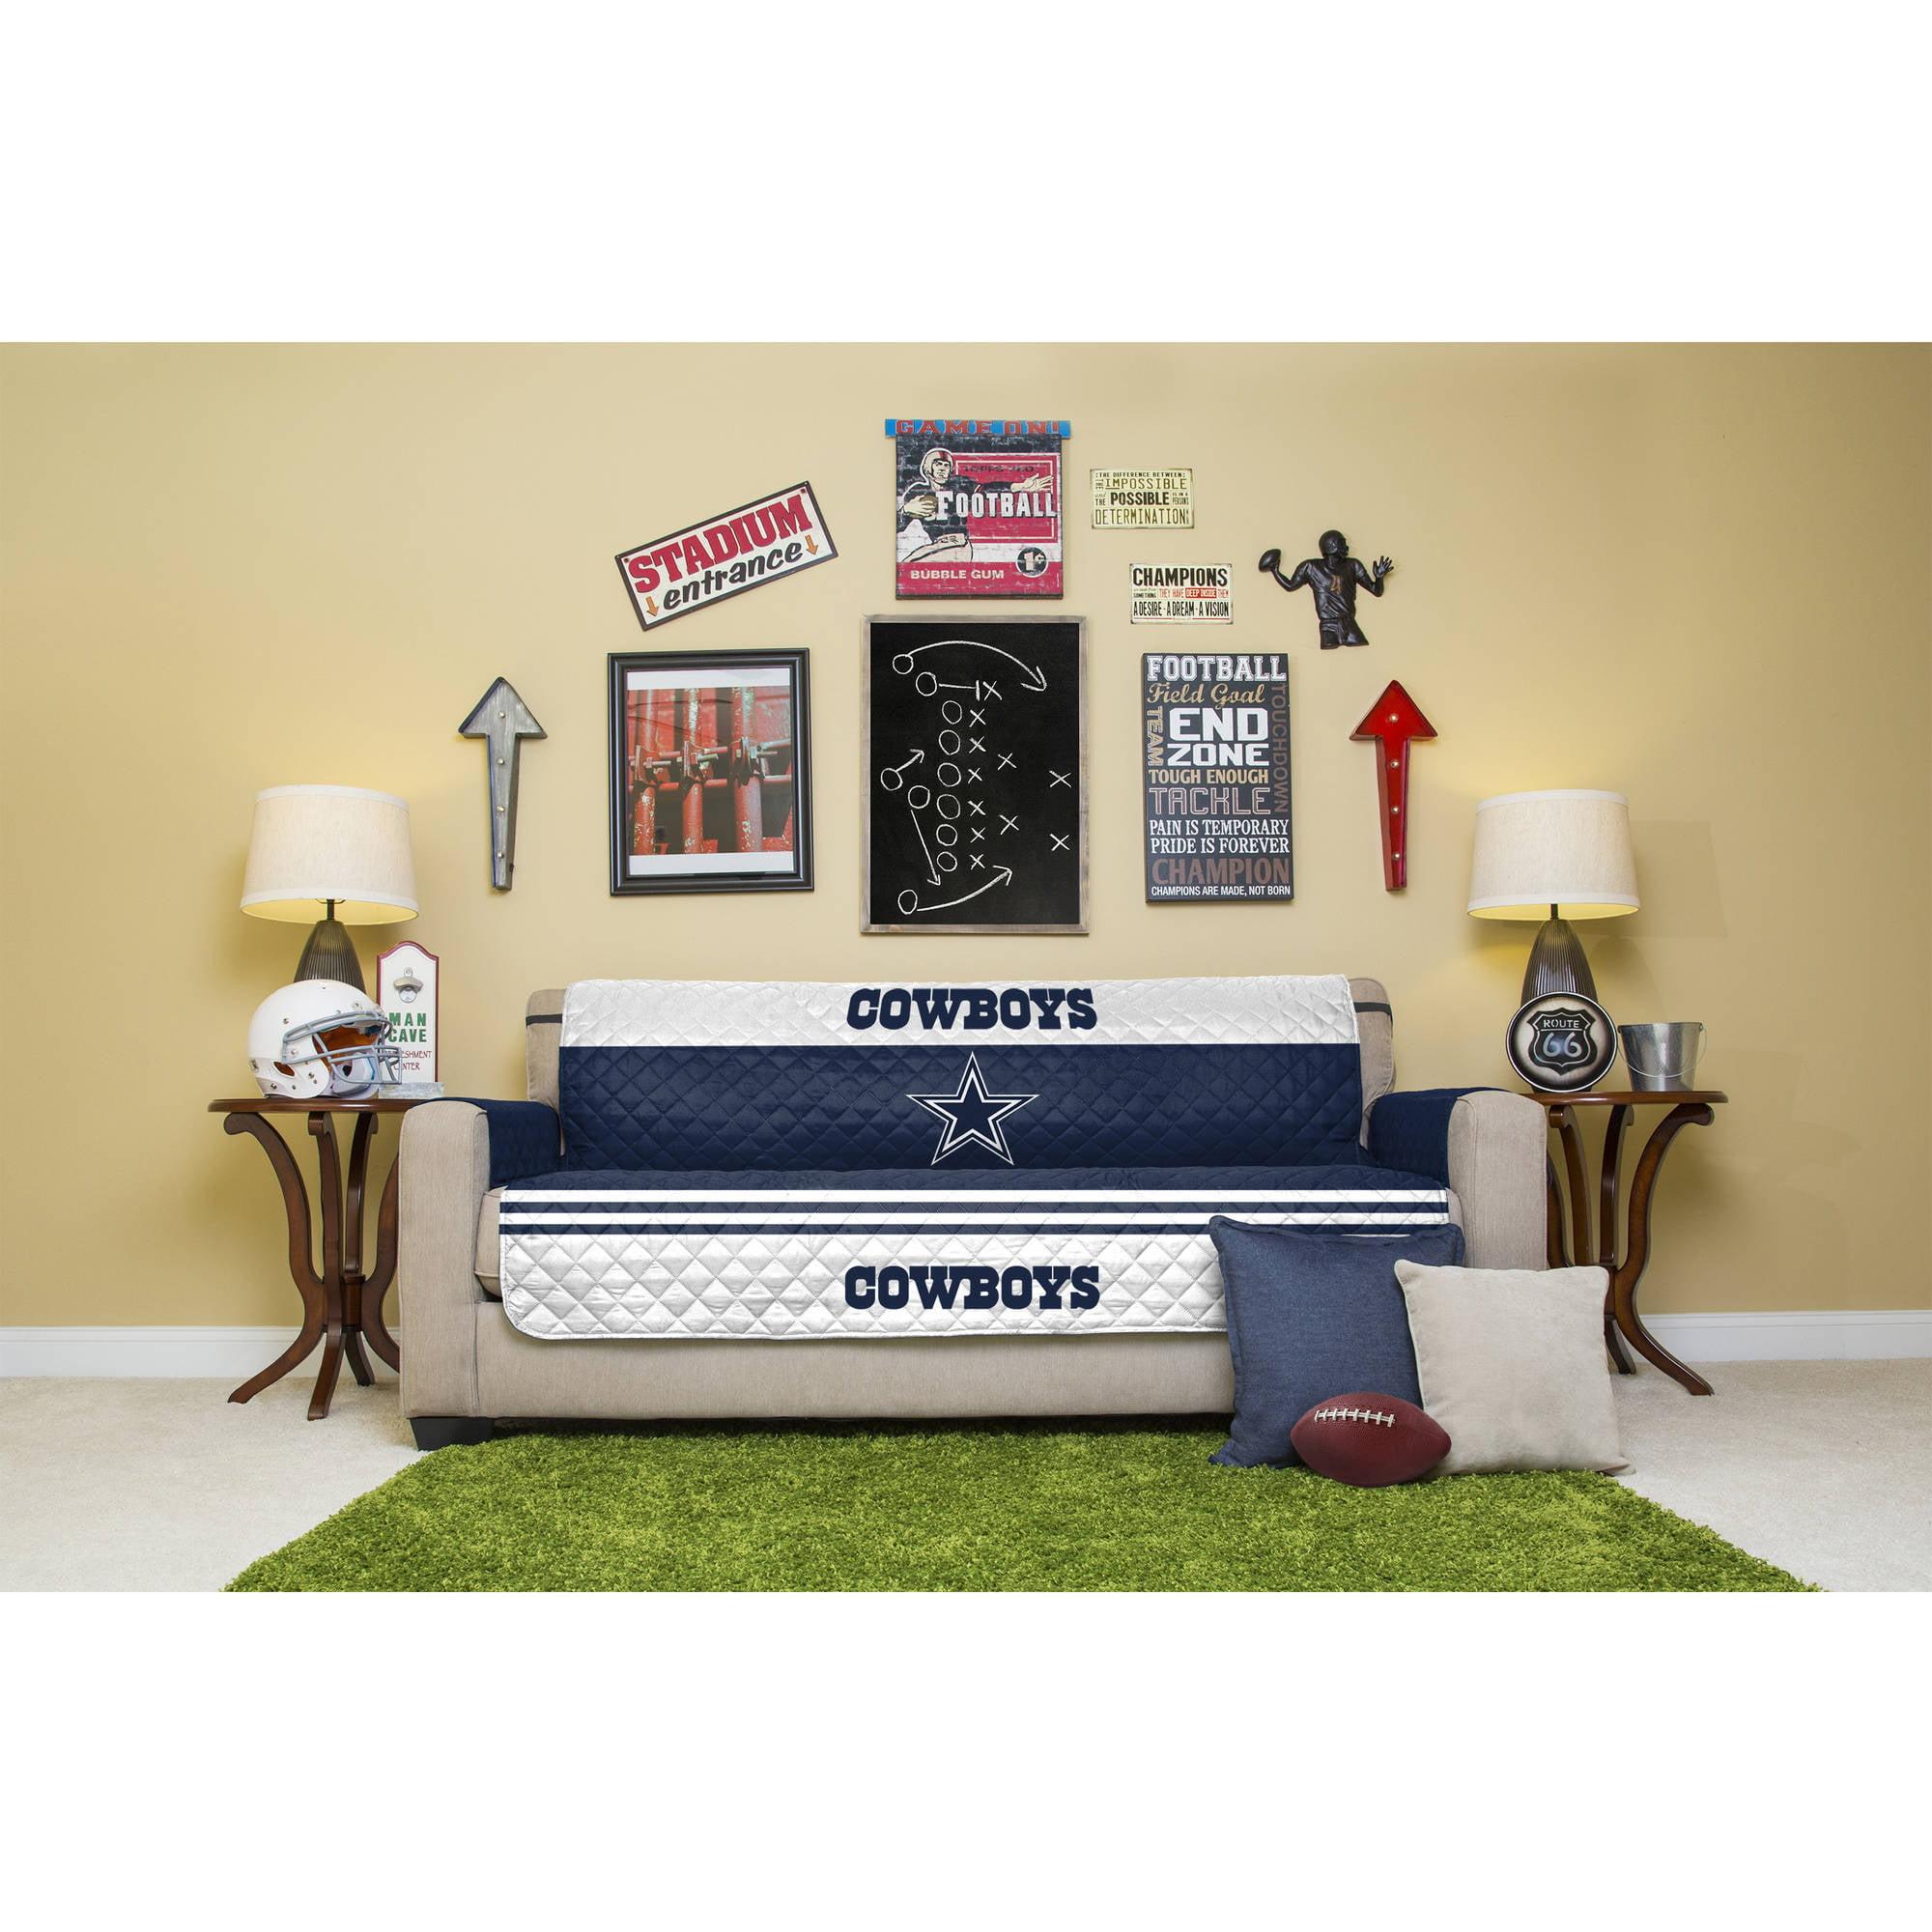 NFL Licensed Furniture Protector, Sofa, Dallas Cowboys by Pegasus Home Fashions Inc